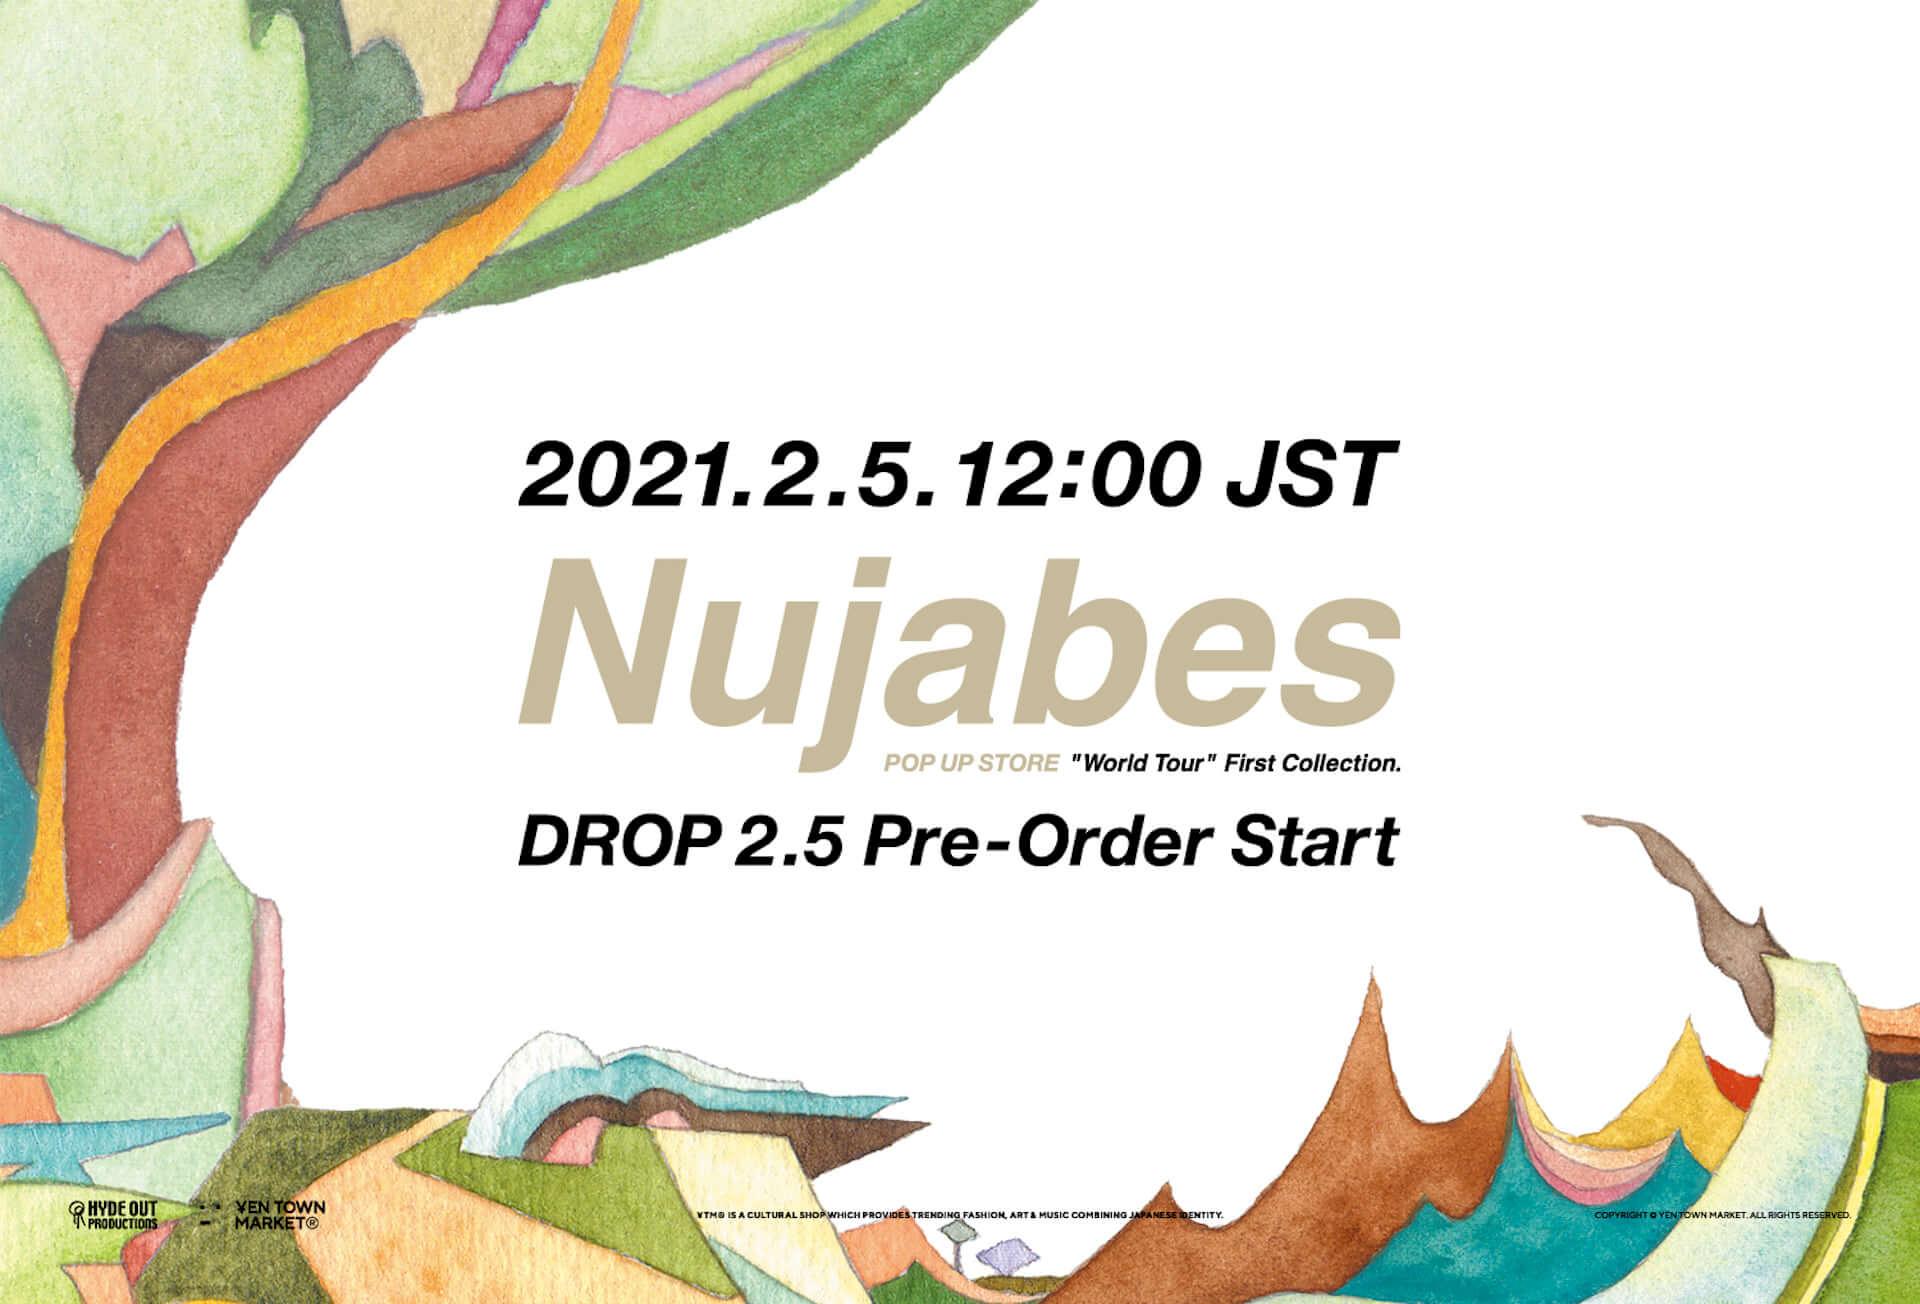 Nujabesの名盤『metaphorical music』ジャケットが施されたTシャツやフーディーなど続々登場!ポップアップ最新グッズの予約受付が開始 lf210205_nujabes_2-1920x1304